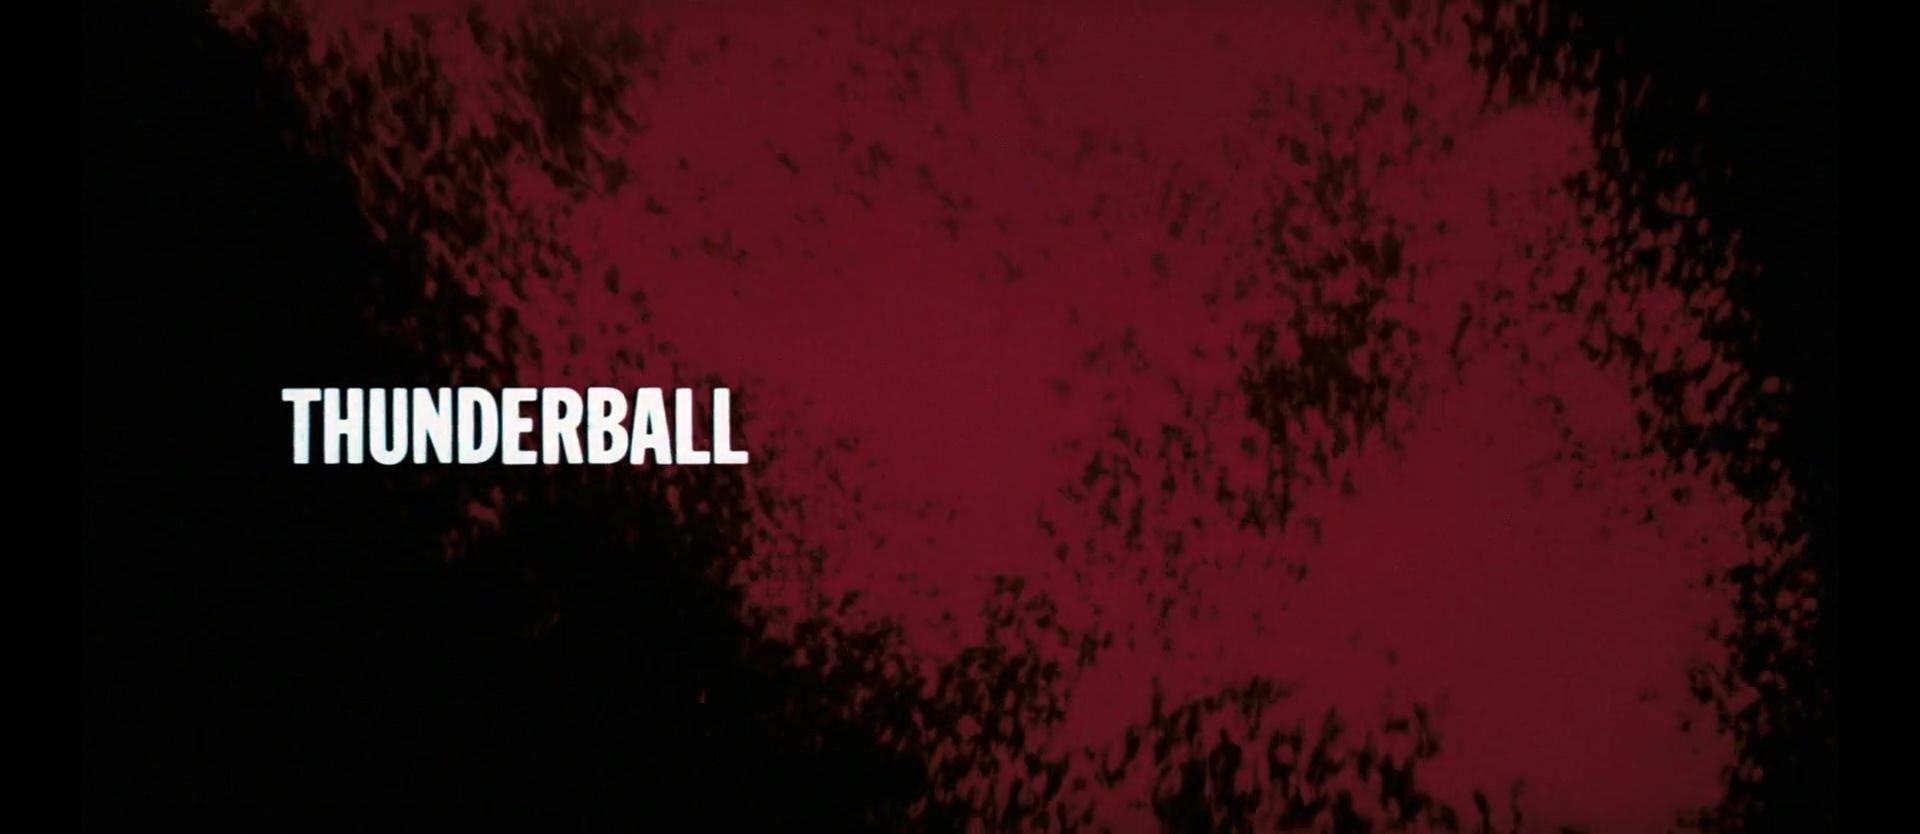 OPÉRATION TONNERRE (Thunderball) de Terence Young (1965)